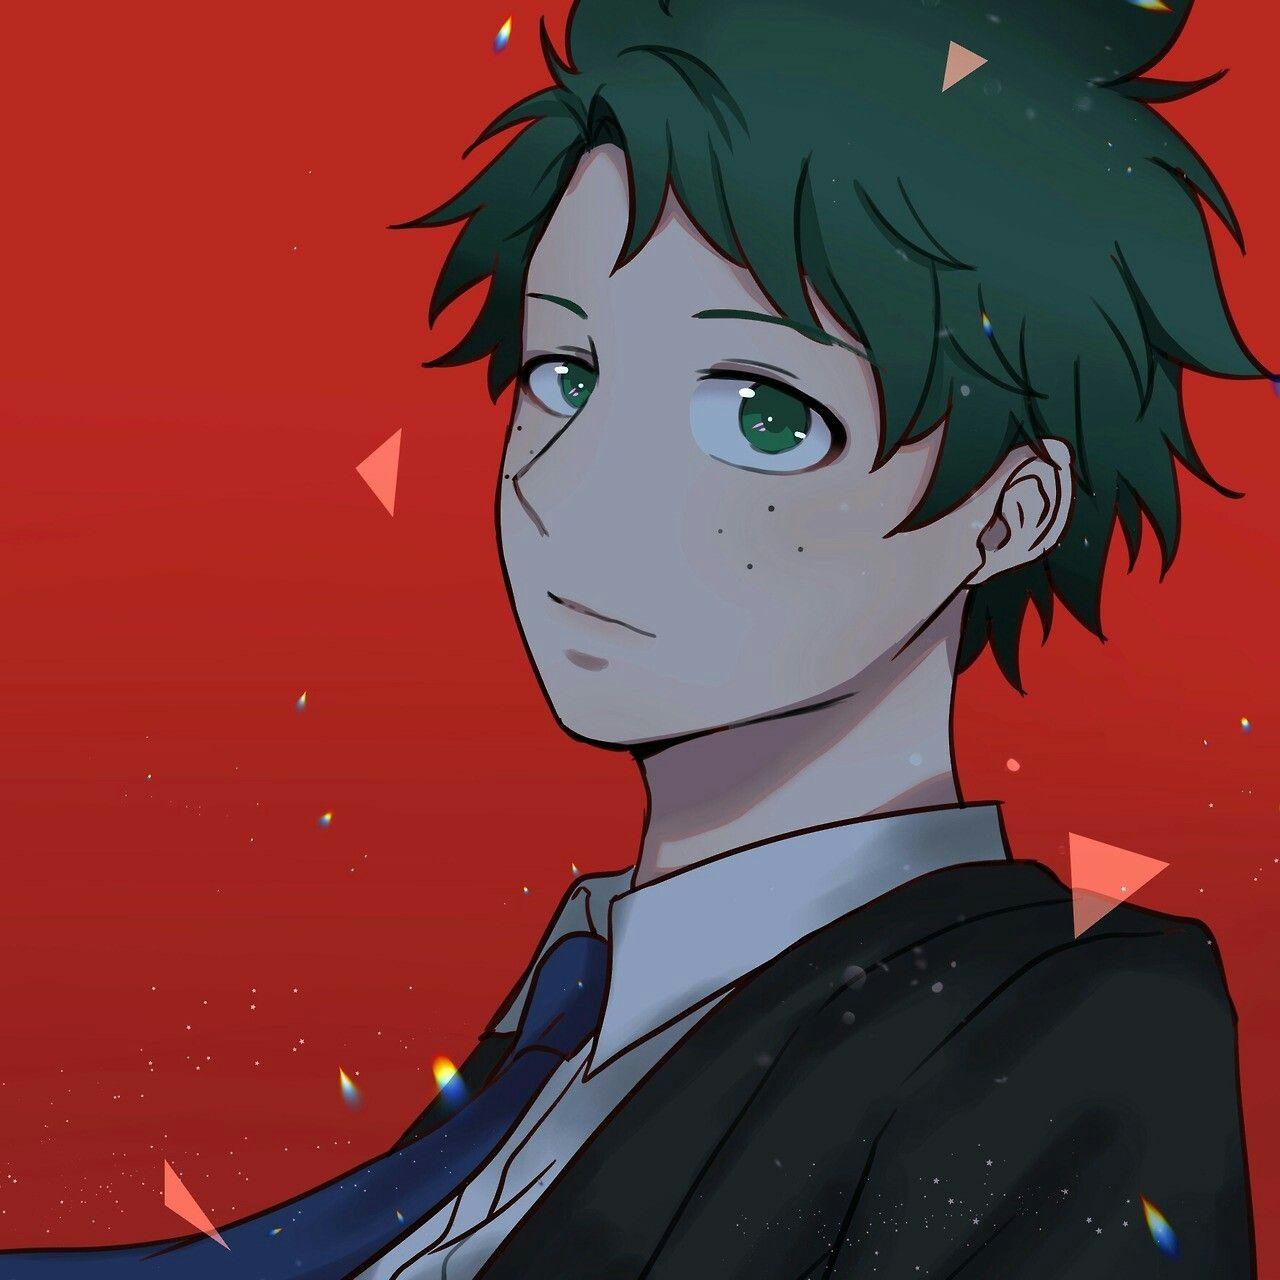 Midoriya Izuku Villain Deku Anime Hero